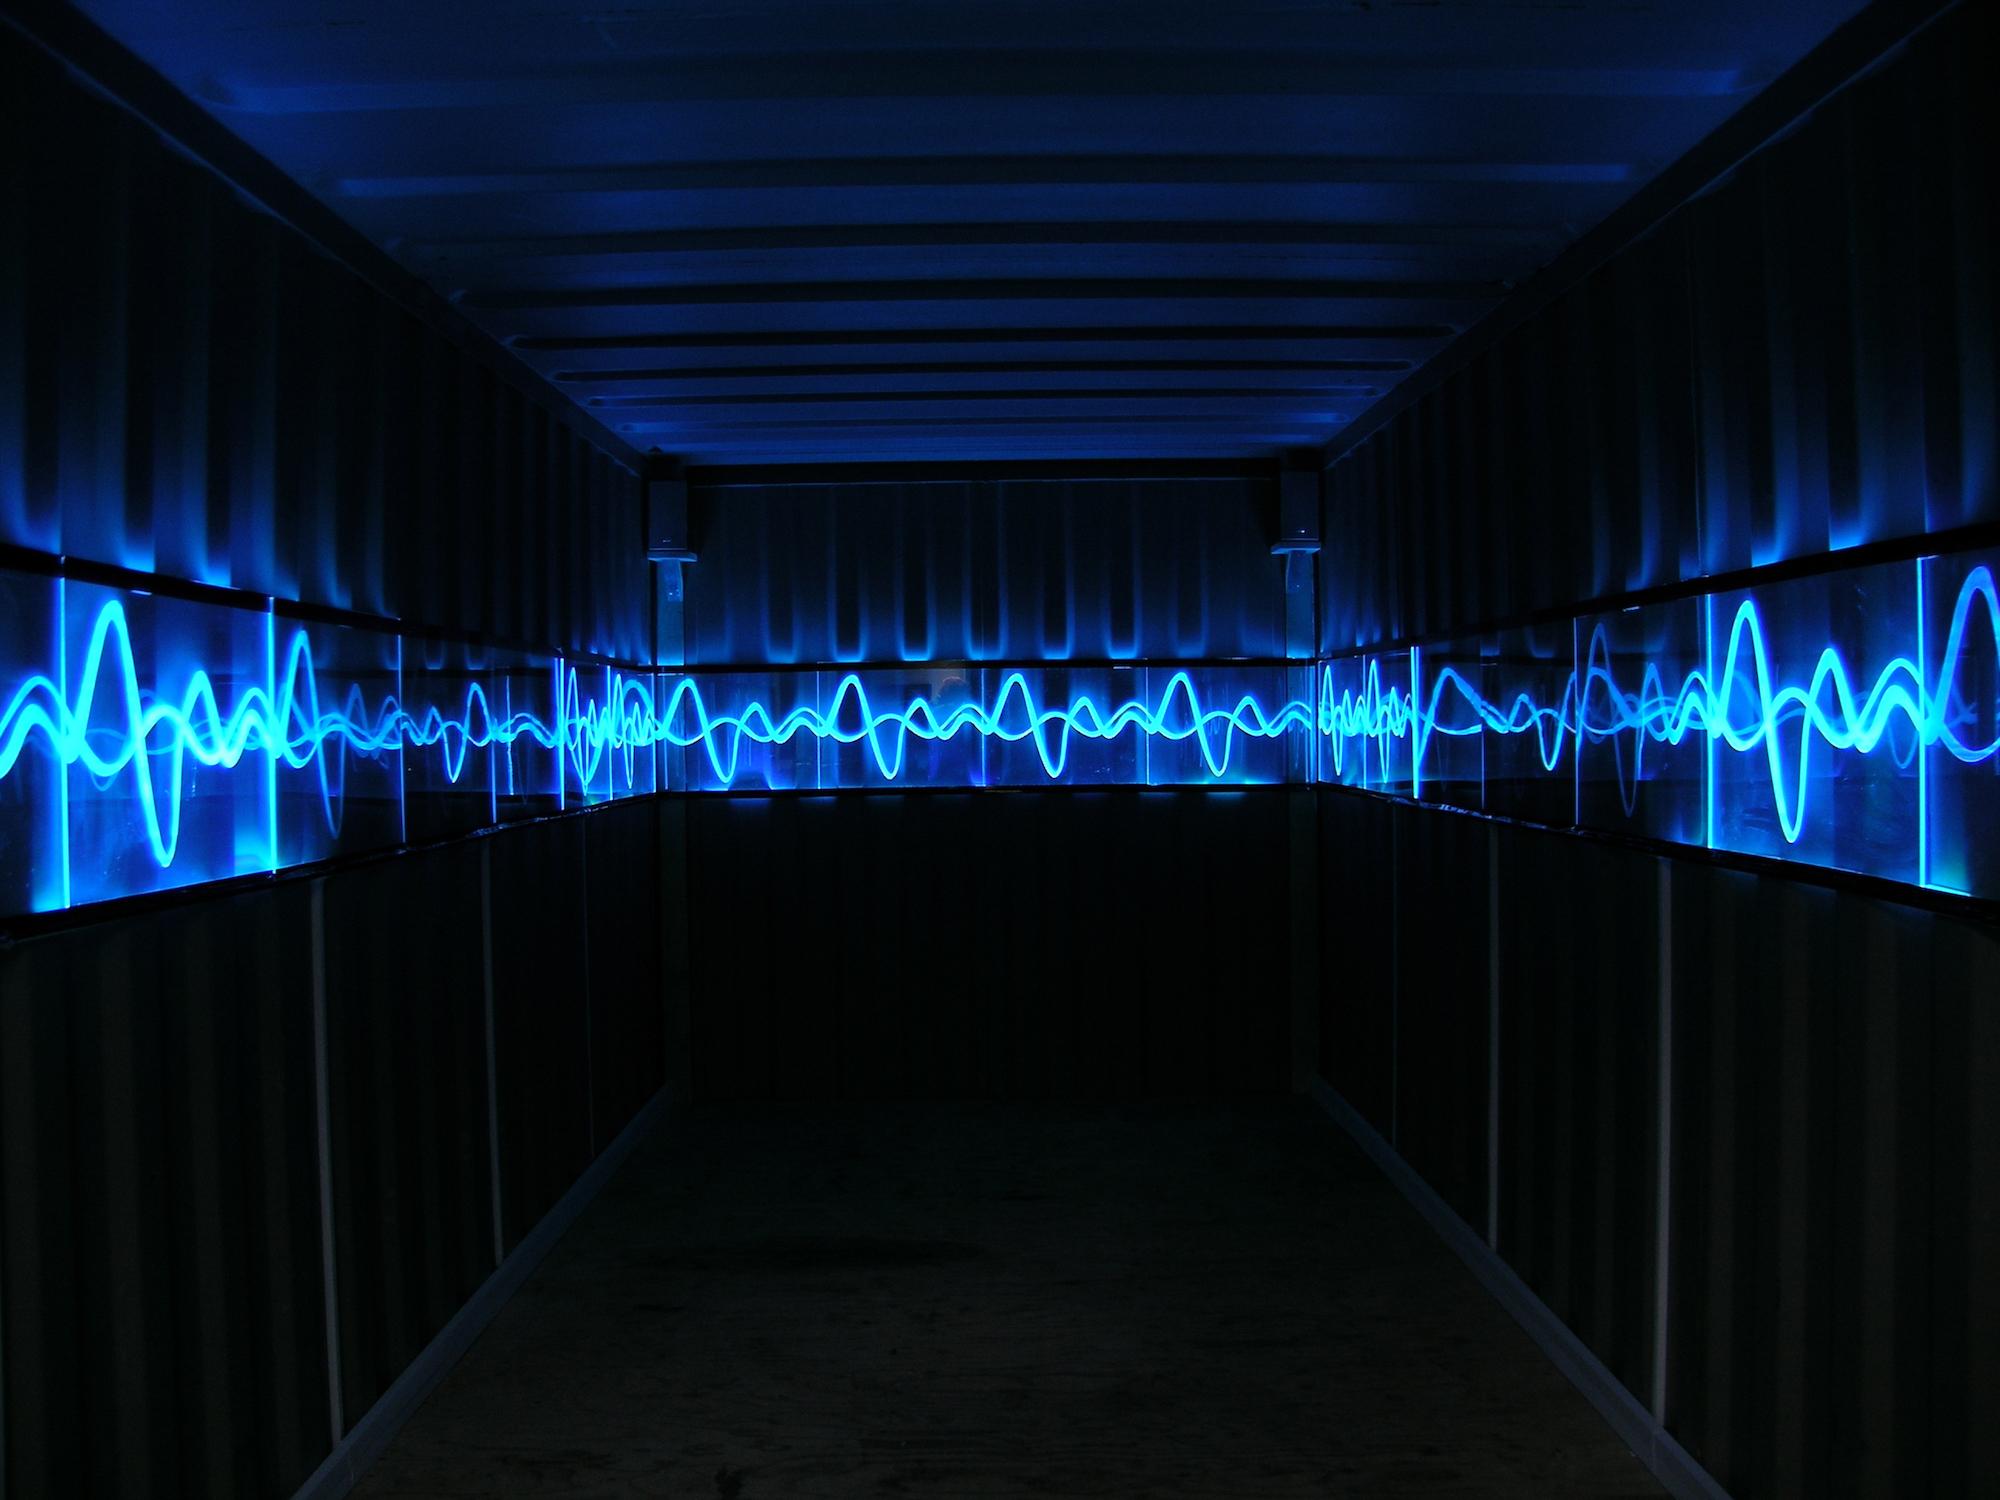 eleanor-bell-light-artist-eden-project-wave-hub.jpg